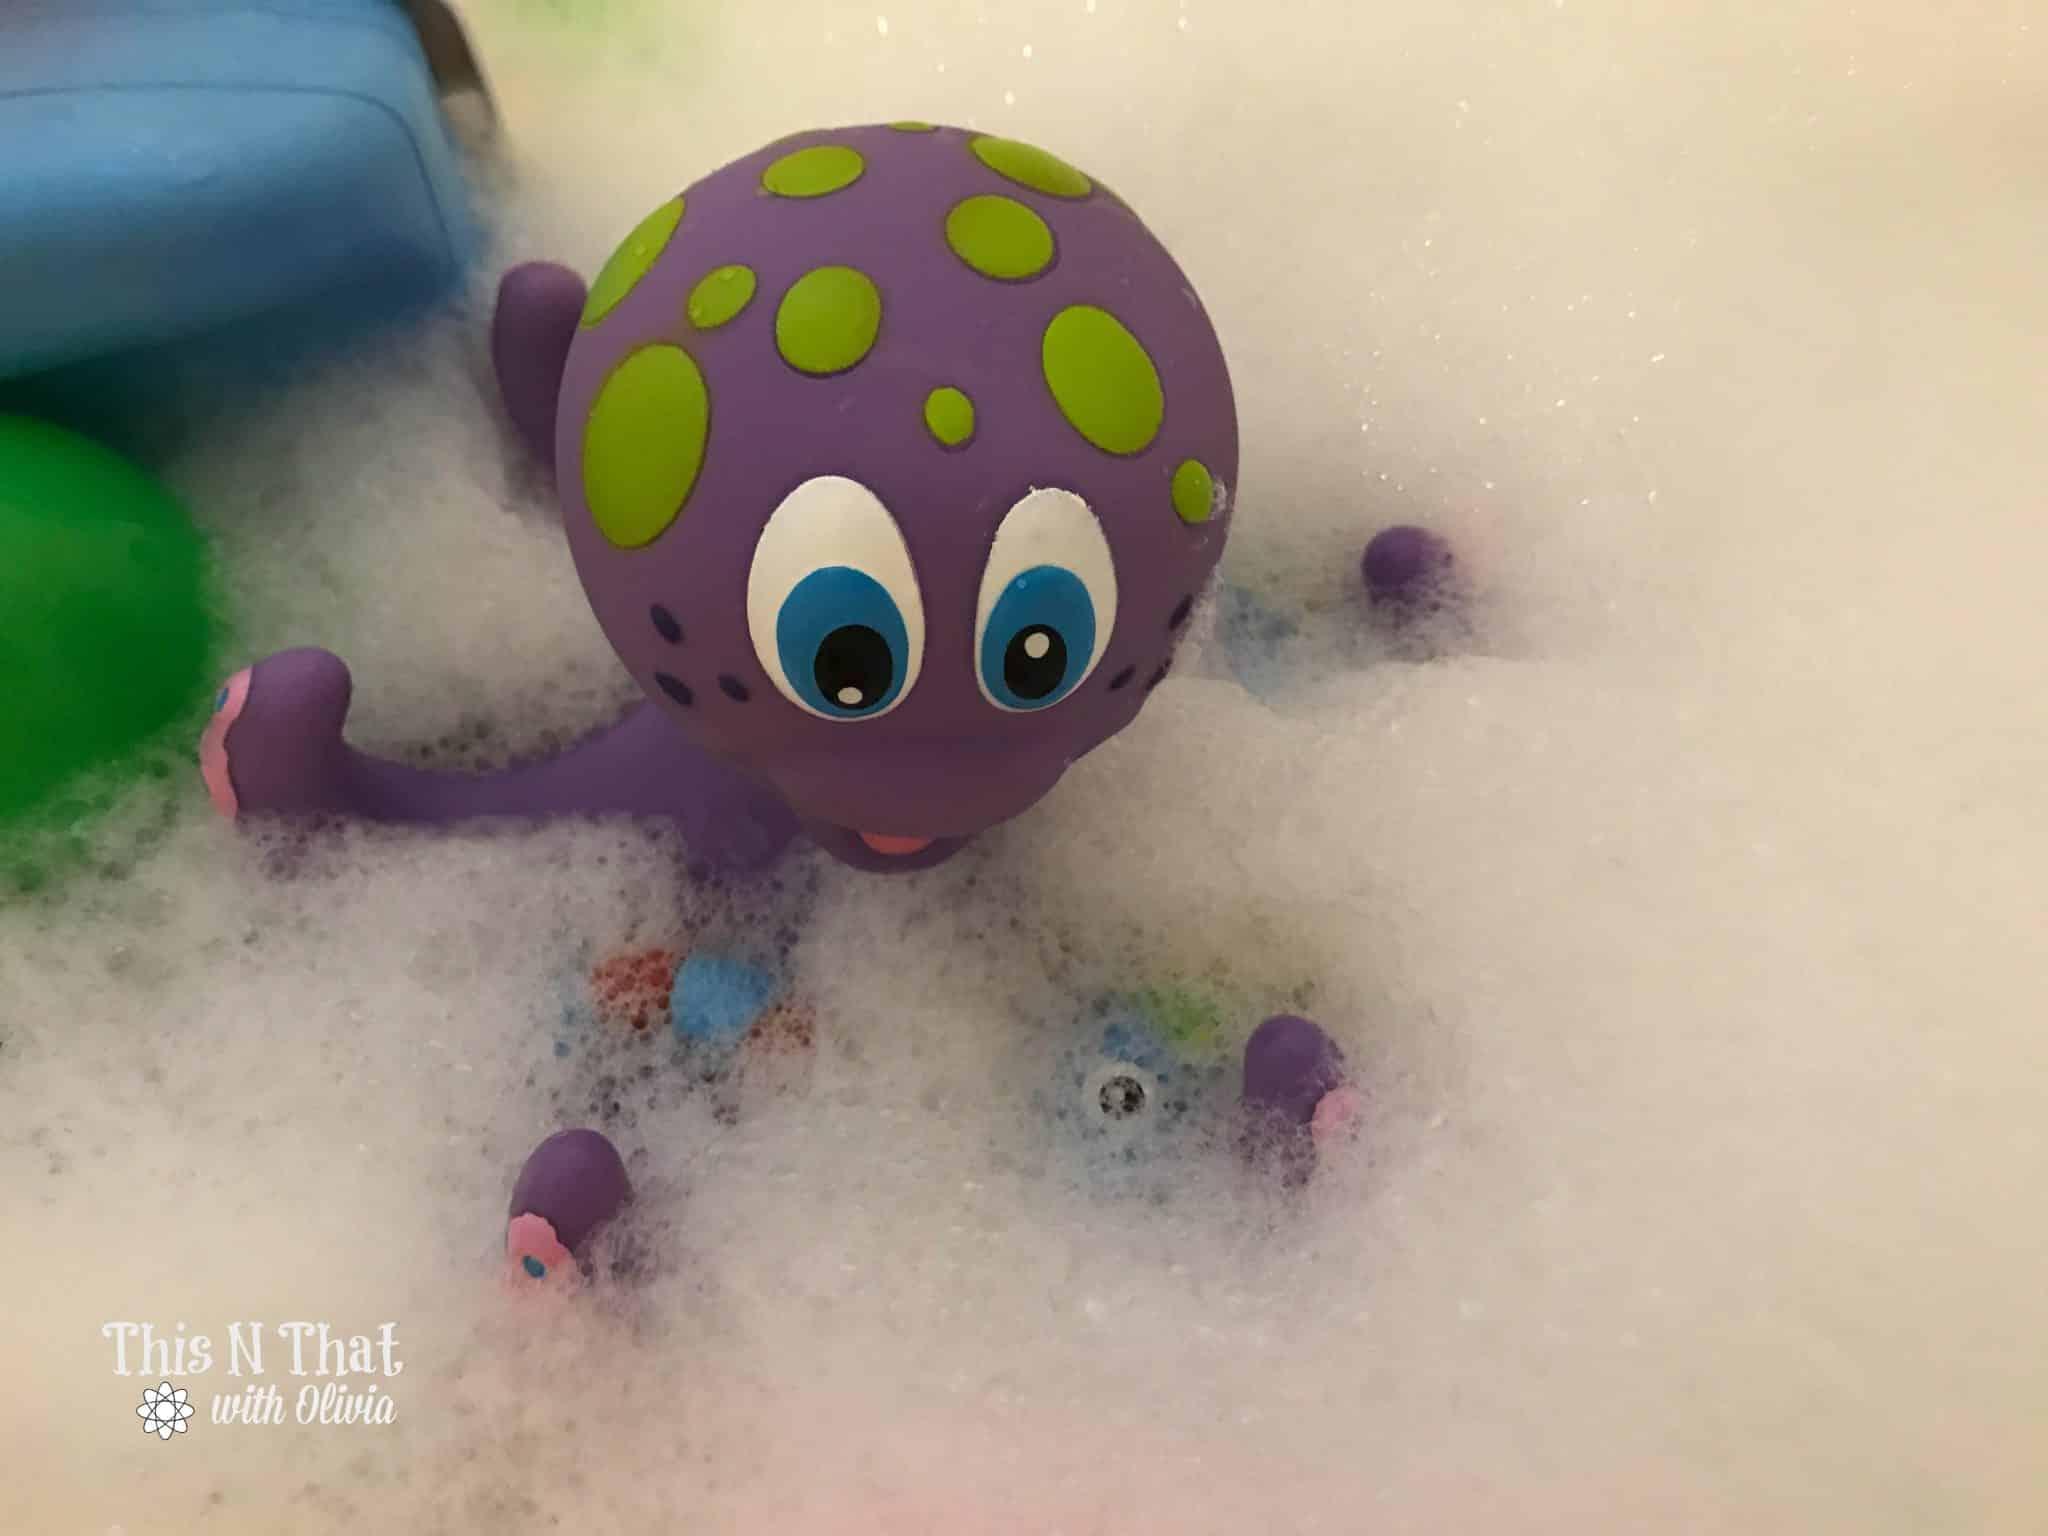 Spring Bathtime Fun with Nuby! @NubyUSA #NubyUSA